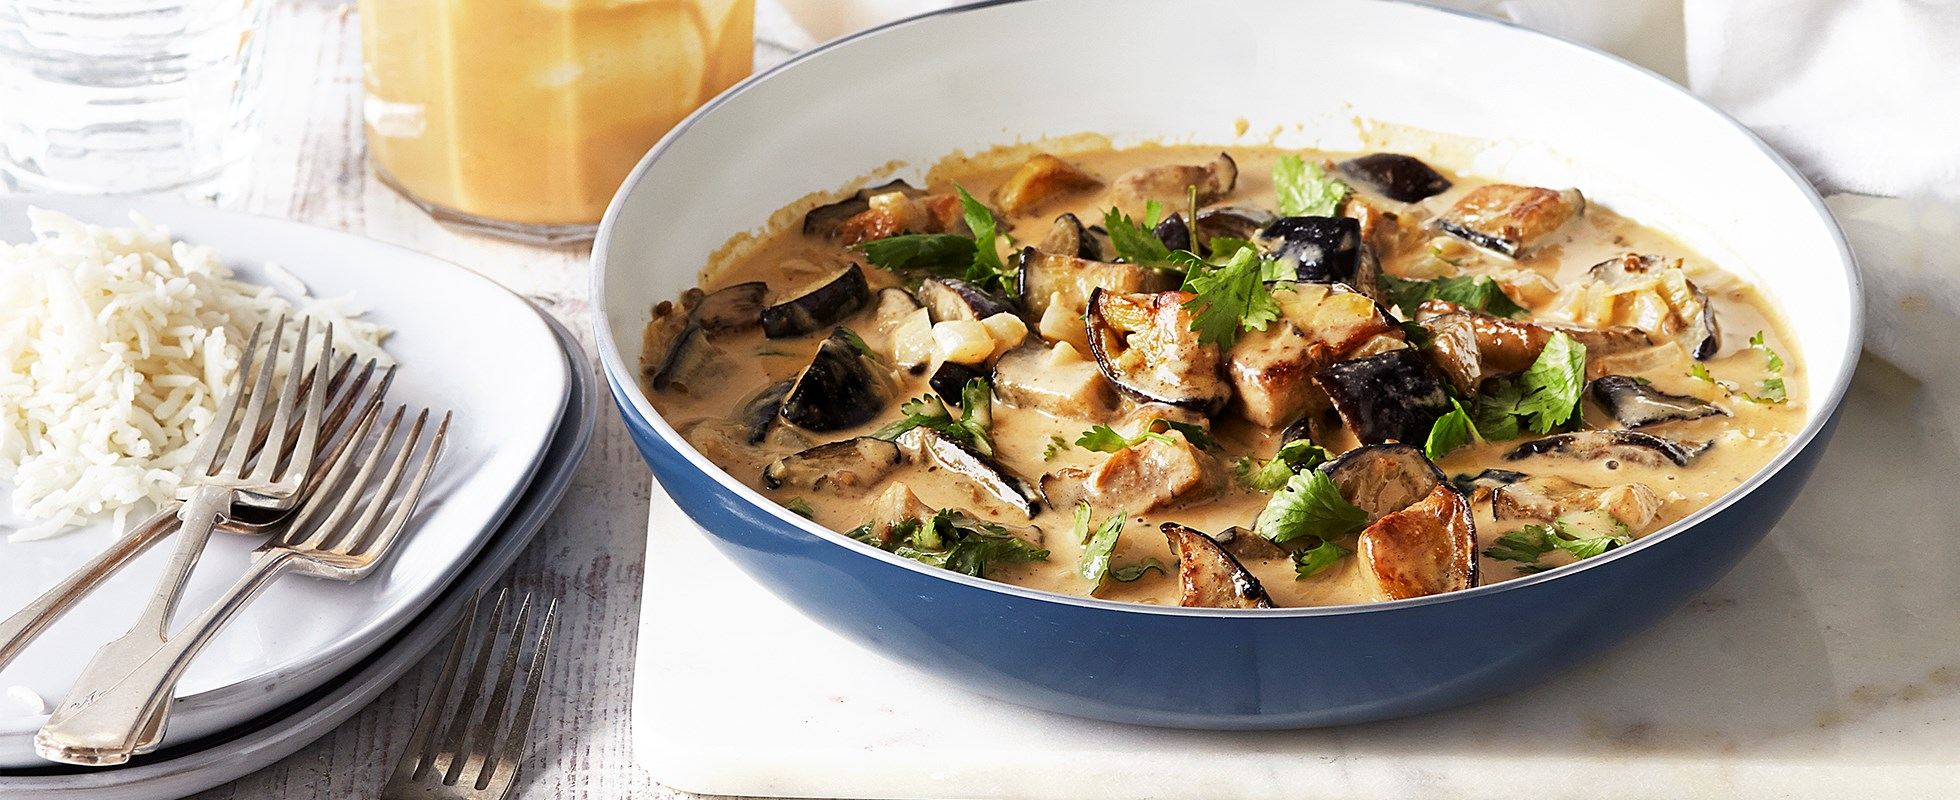 Coconut and peanut aubergine curry